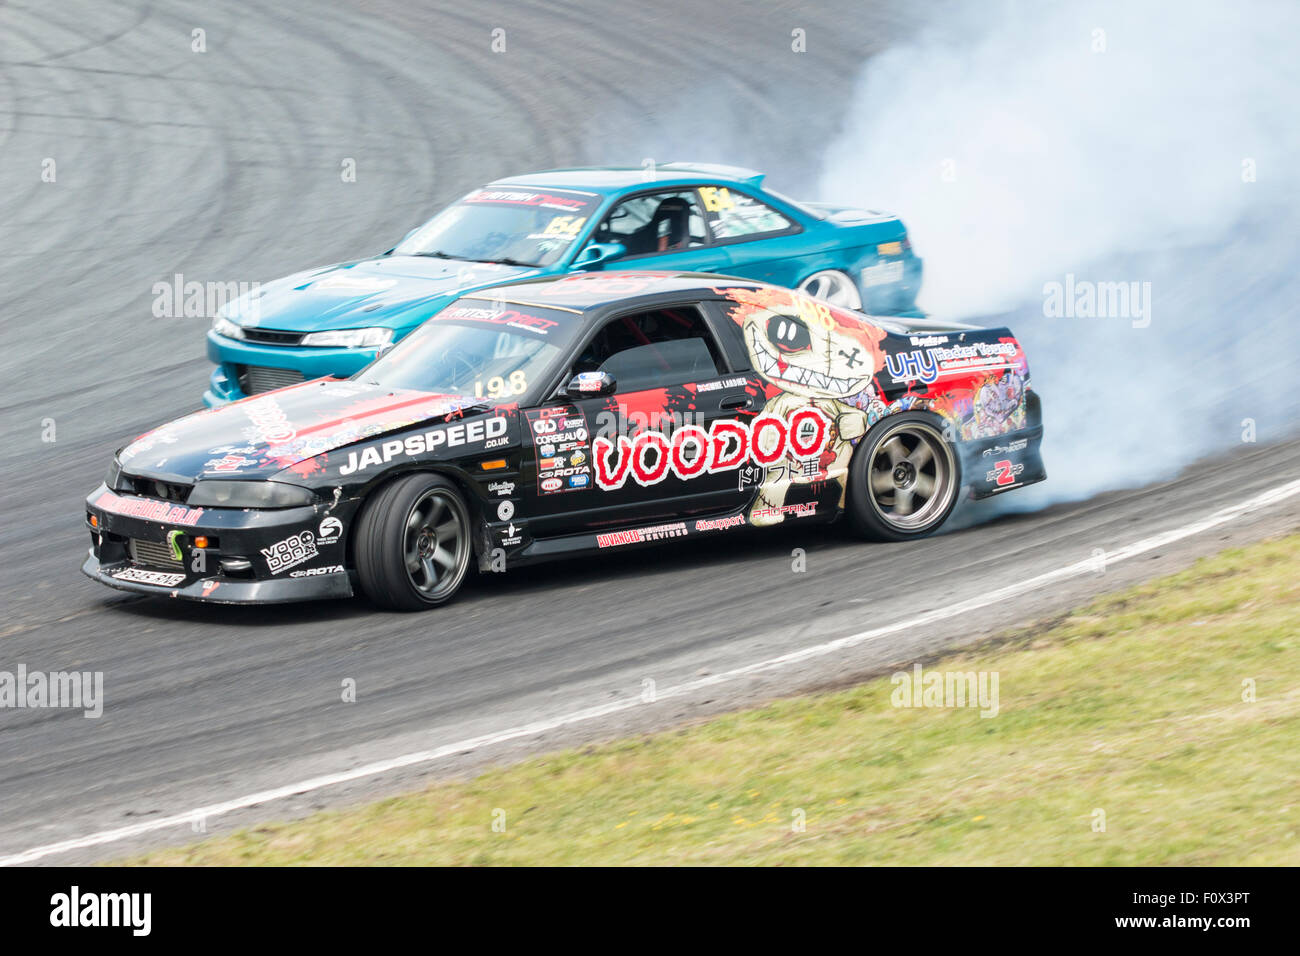 British Drift Championship Teesside Autodrome 2015 Team Voodoo 198 Mike Lardner, TeamSuperDrift 154 Neil Bamford - Stock Image